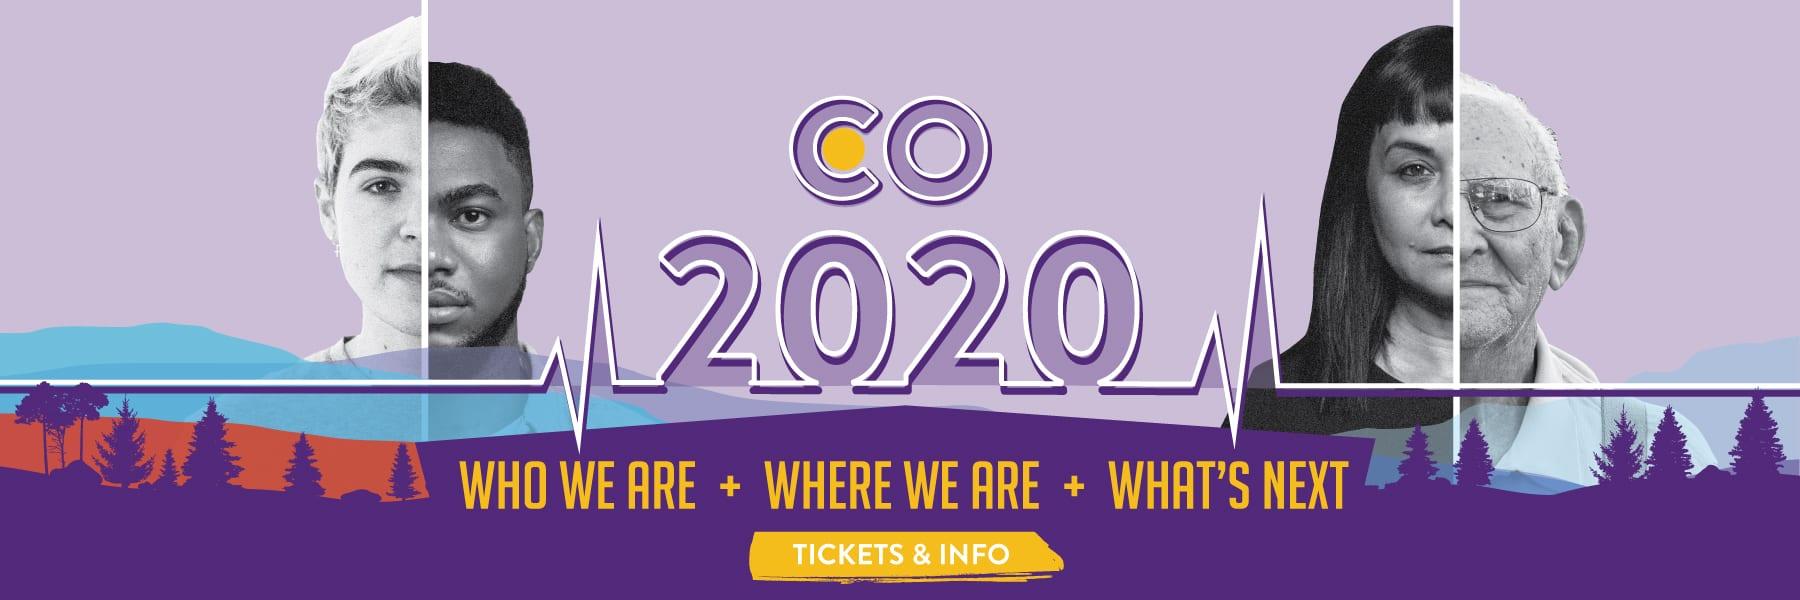 CO-2020